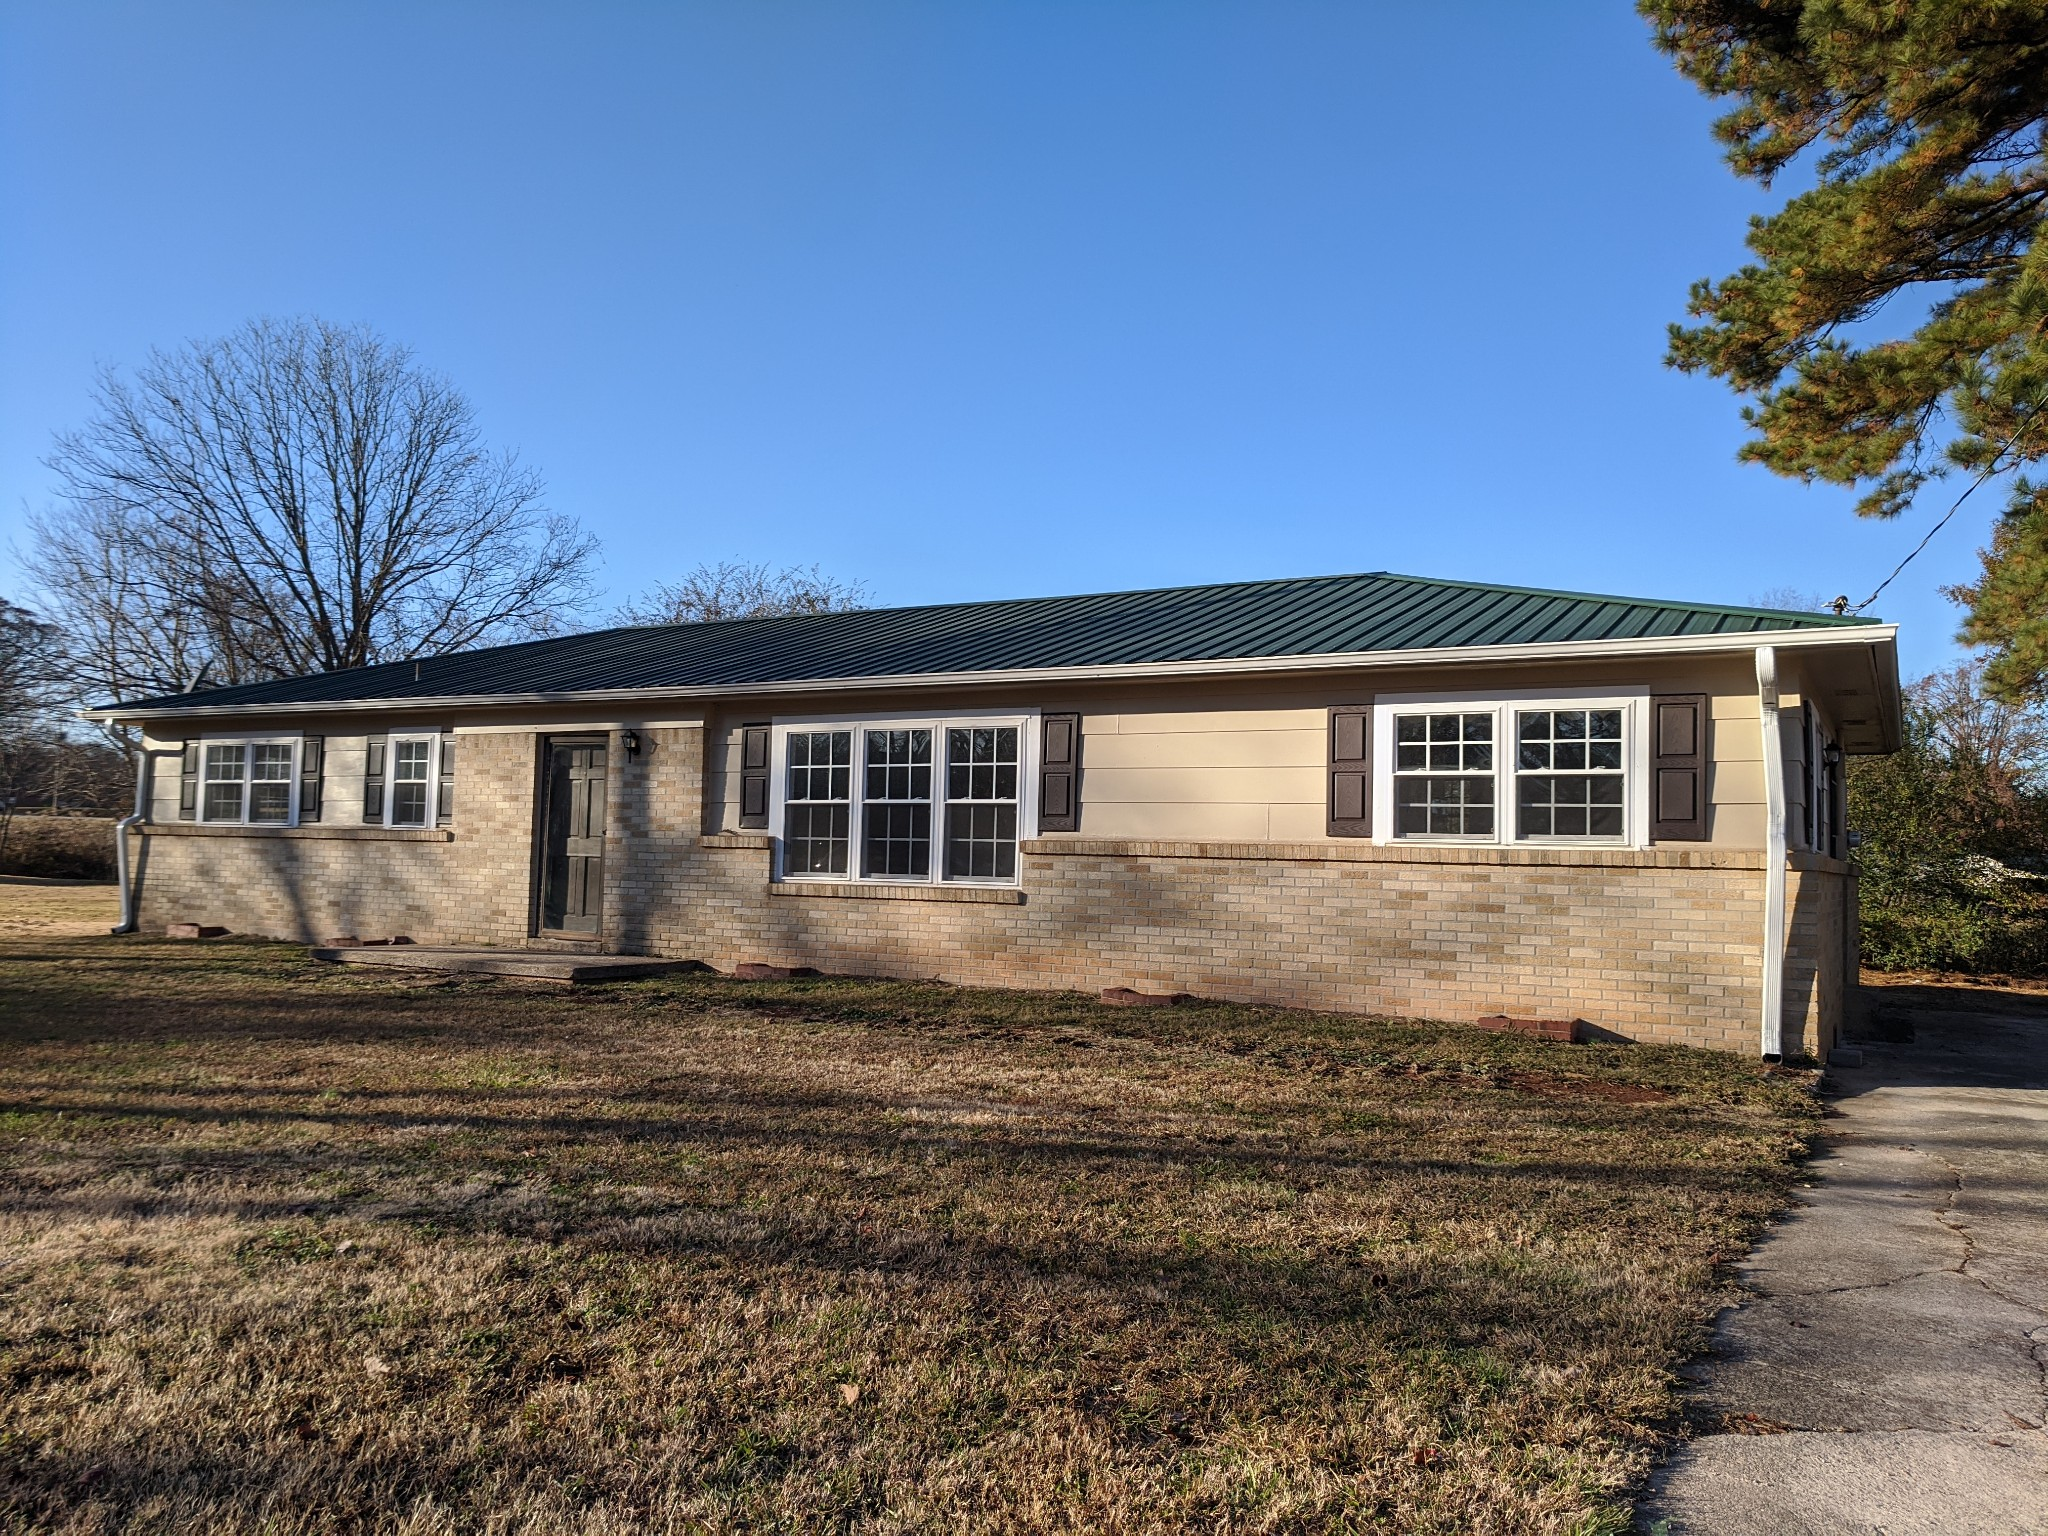 101 Dallas St, Huntland, TN 37345 - Huntland, TN real estate listing